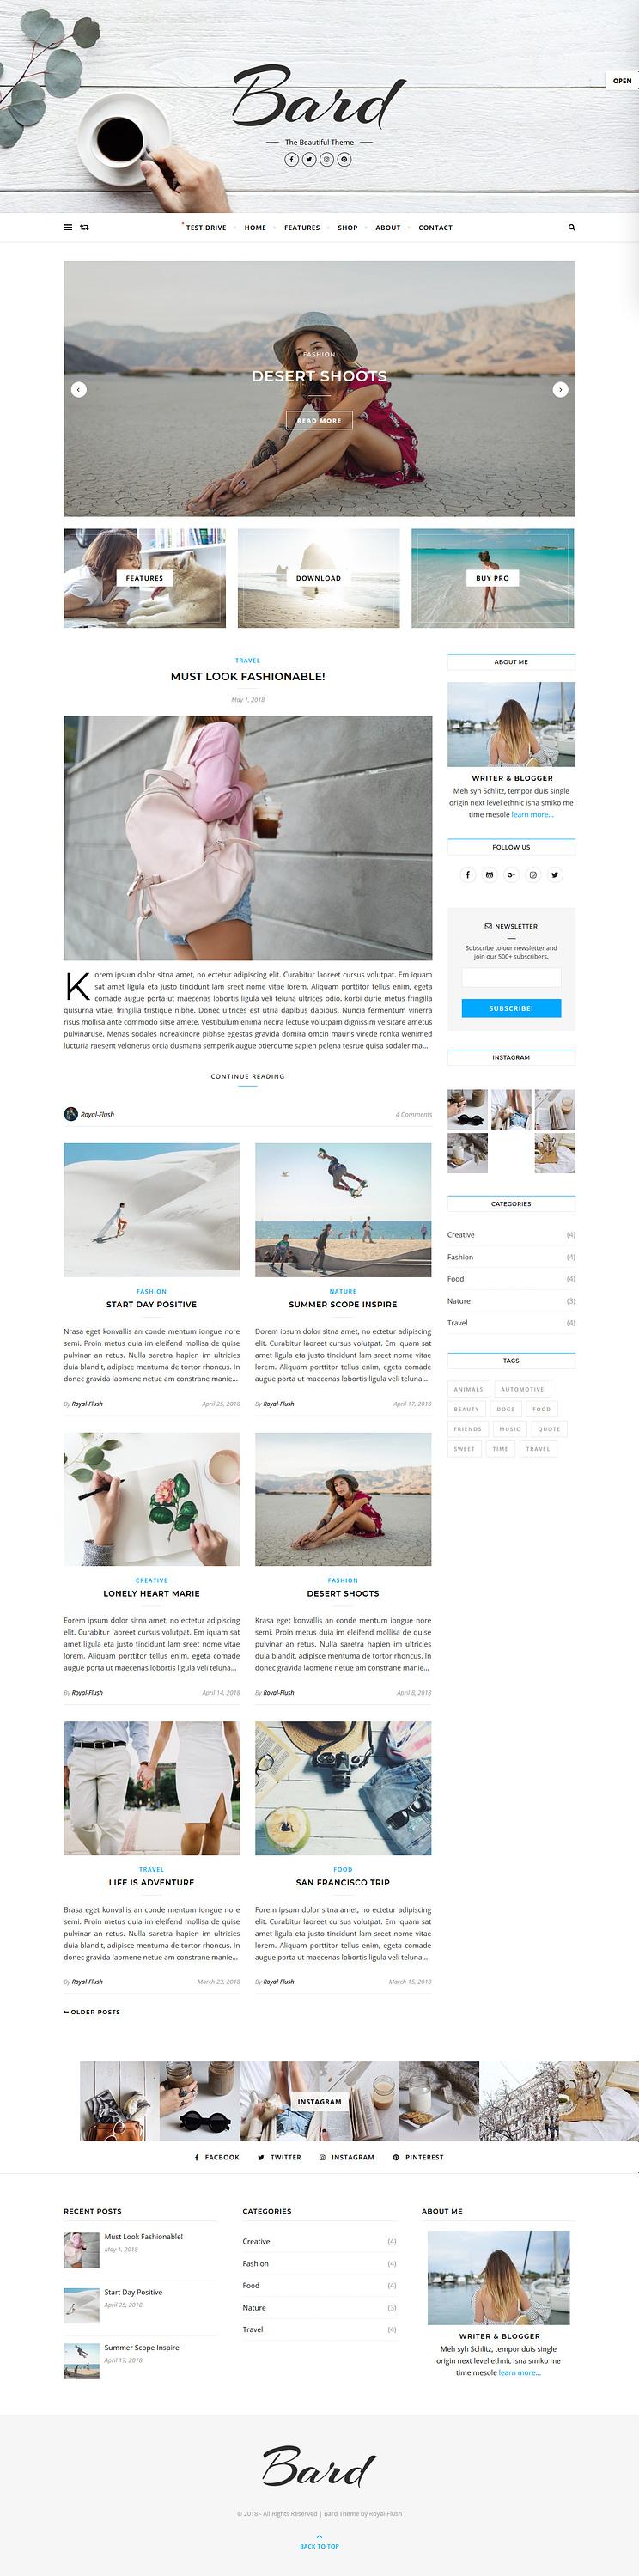 bard best free fullscreen wordpress theme - 10+ Best Free FullScreen WordPress Themes